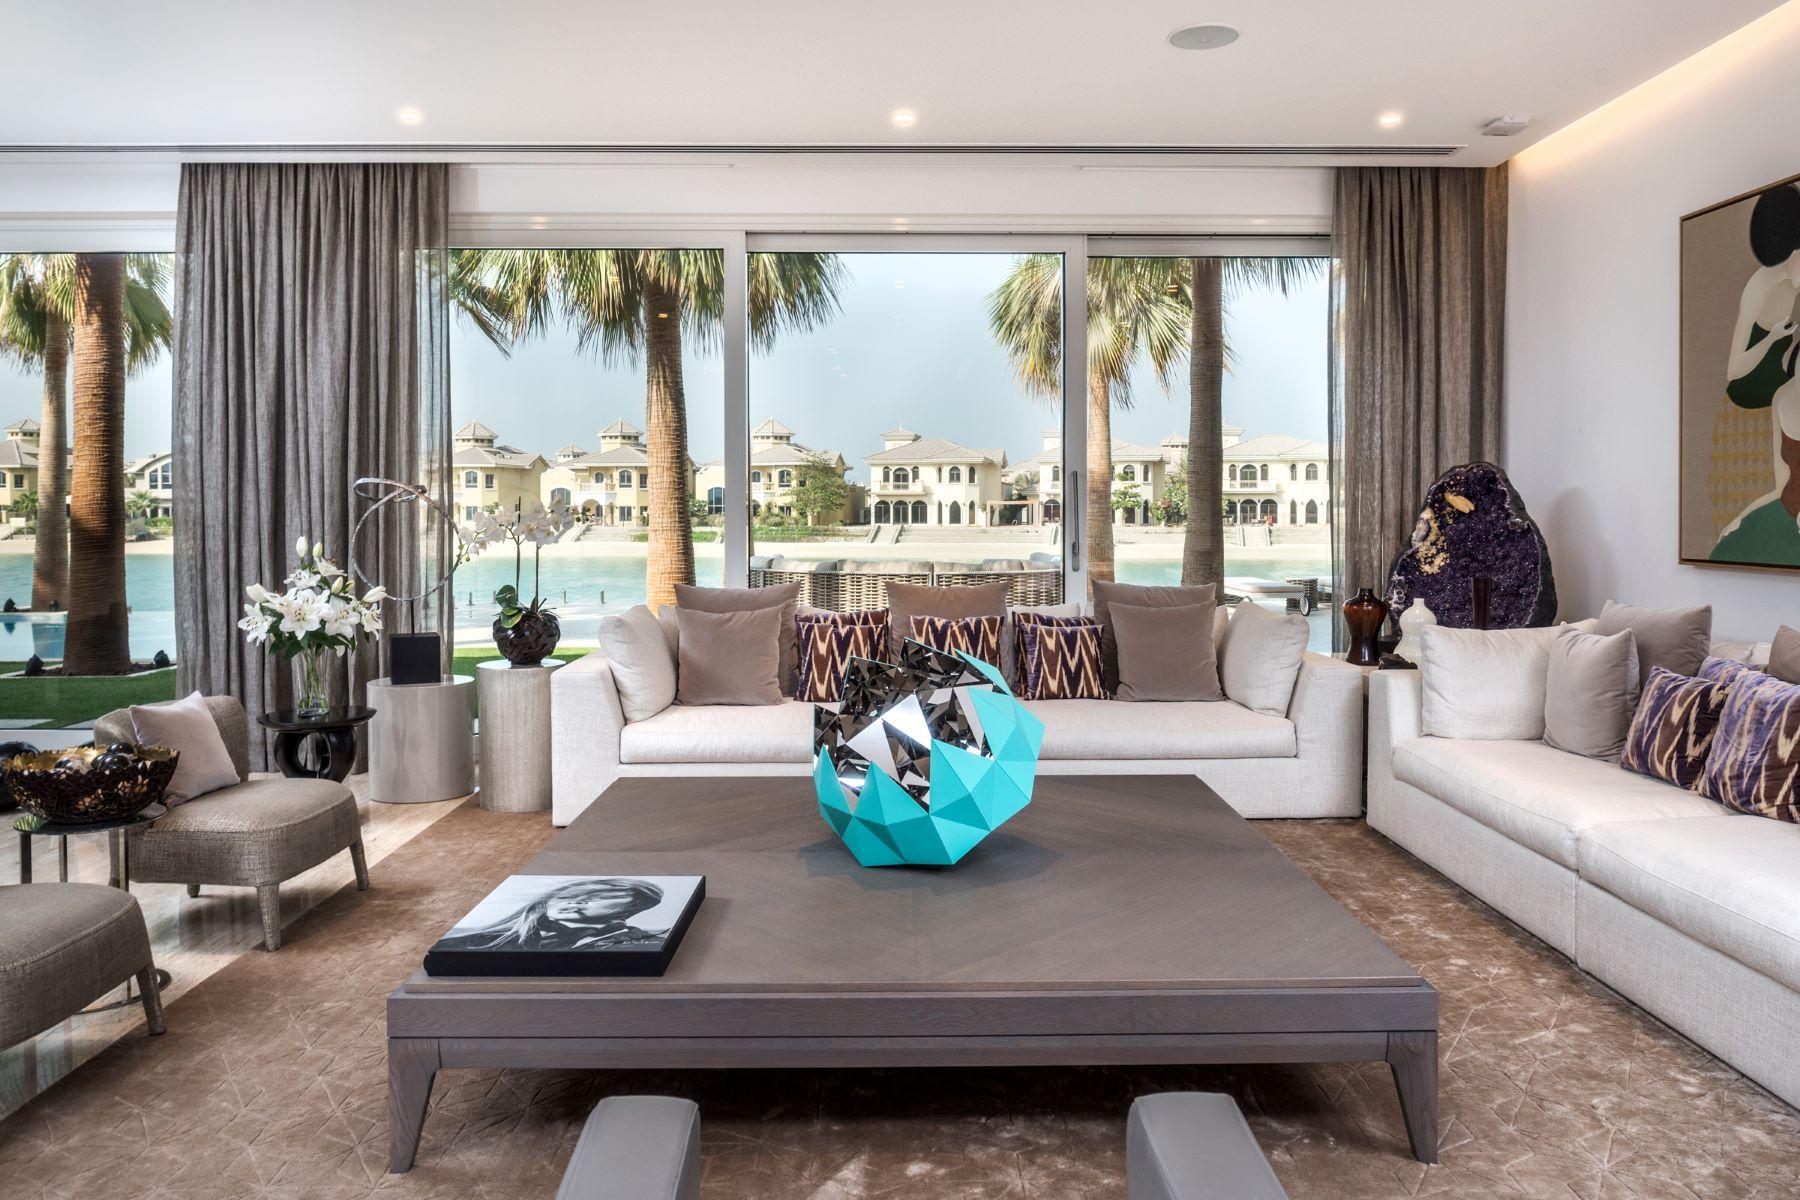 Single Family Home for Sale at Contemporary Signature Villa Dubai, United Arab Emirates